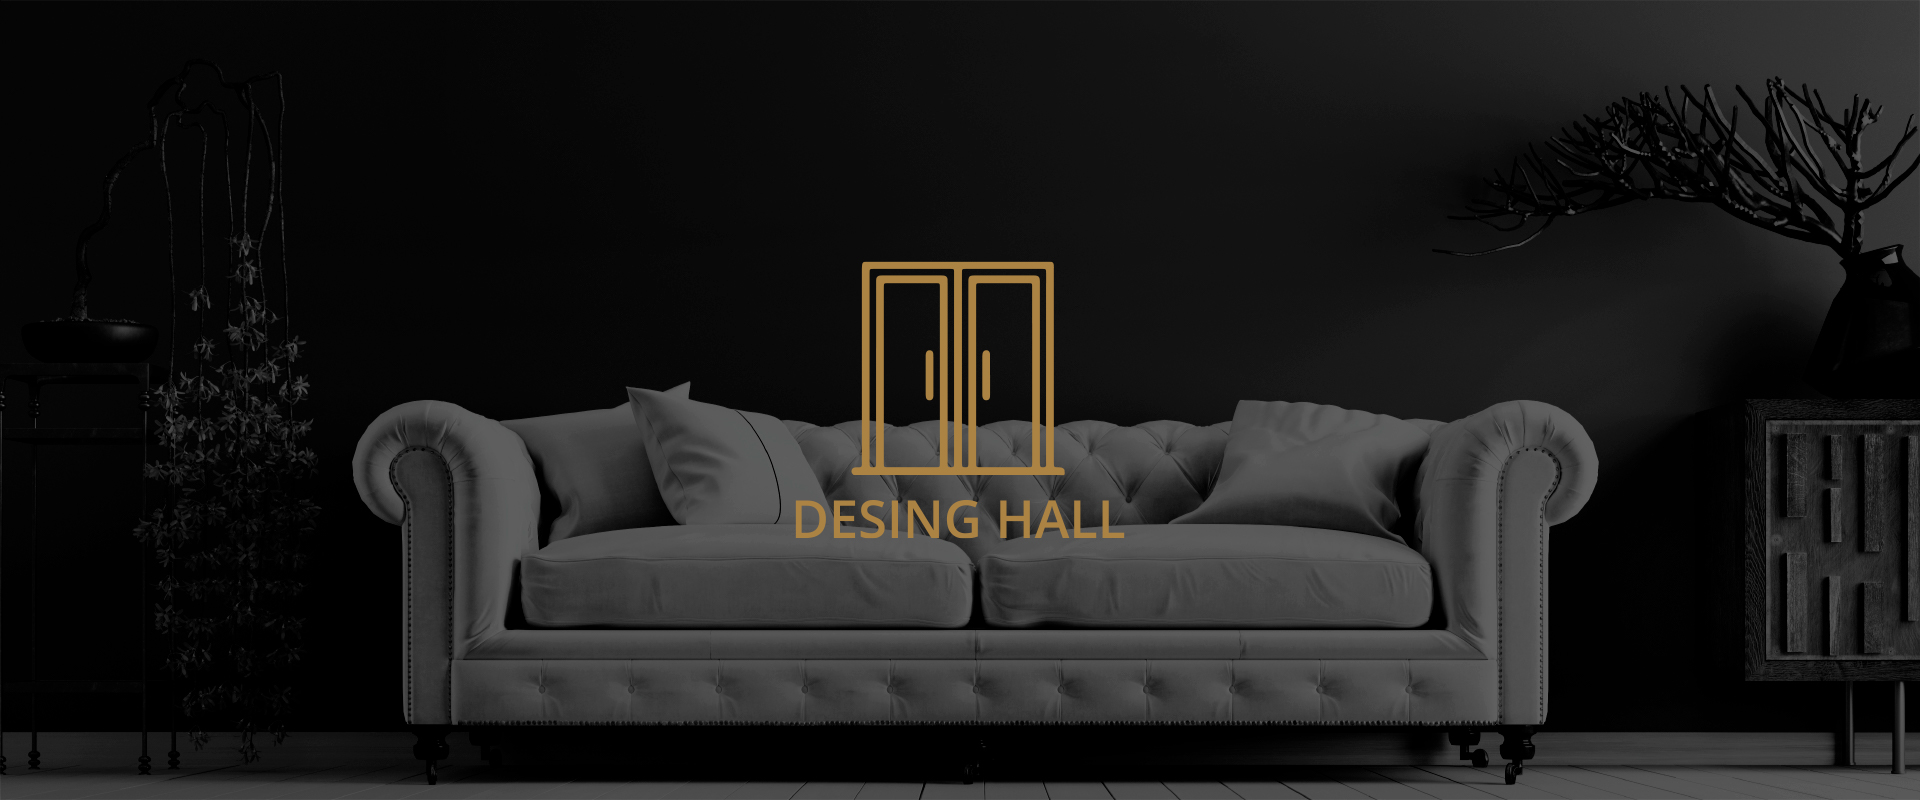 desing hall+icono